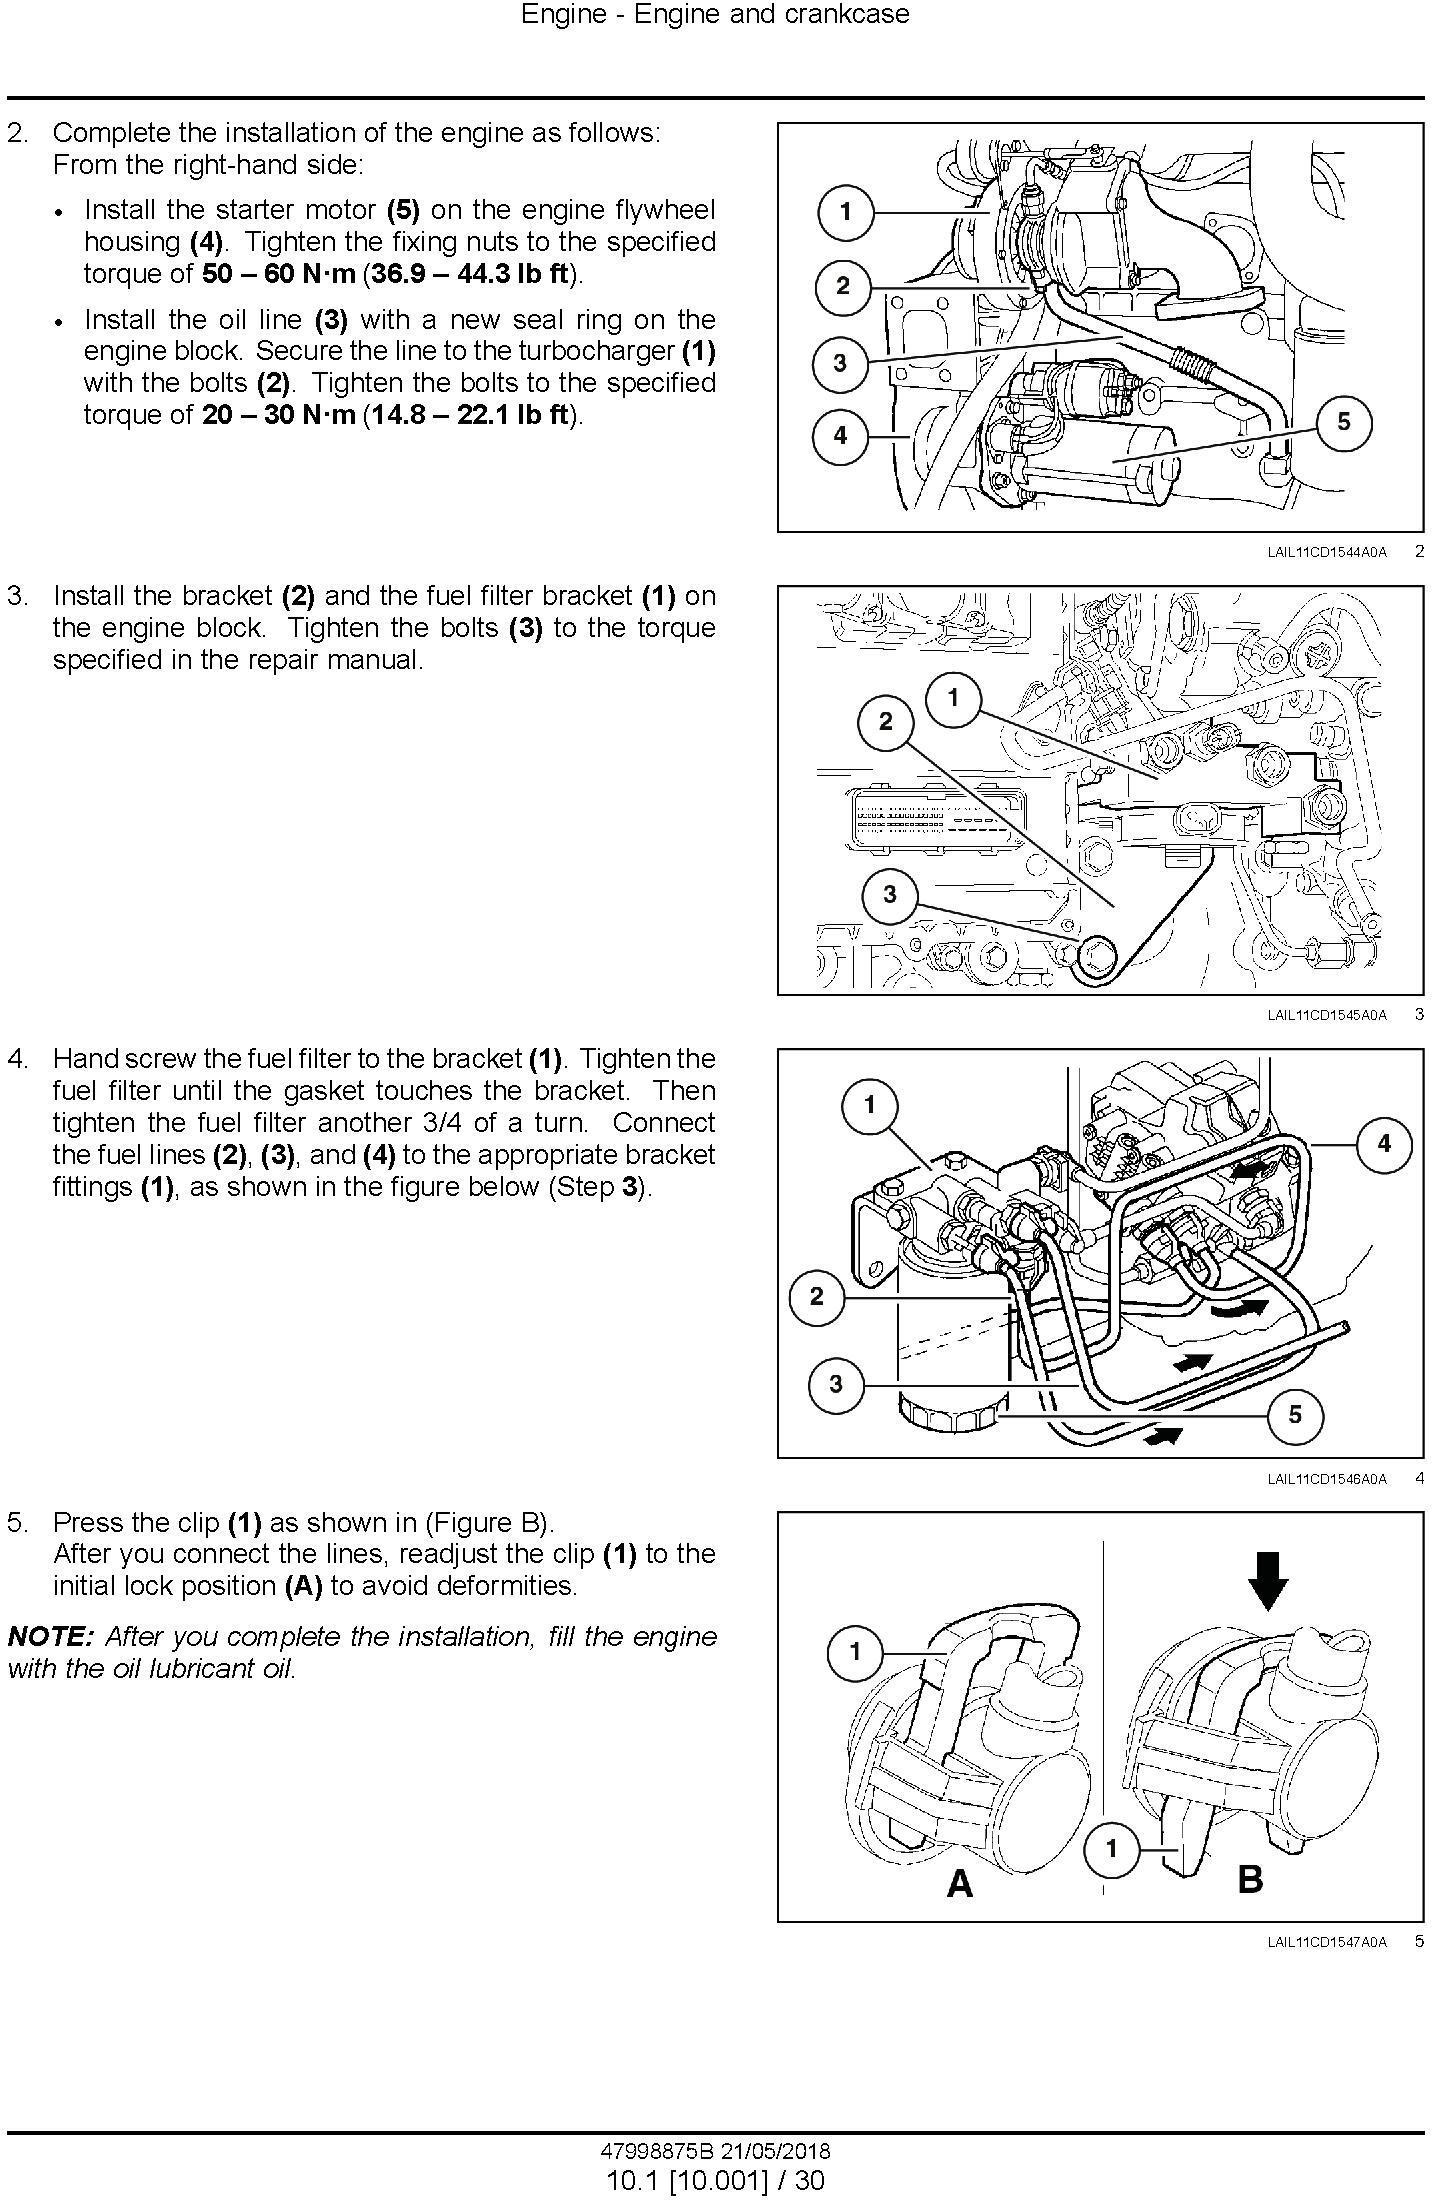 New Holland D150B XLT Crawler Dozer Service Manual (Brasil) - 2